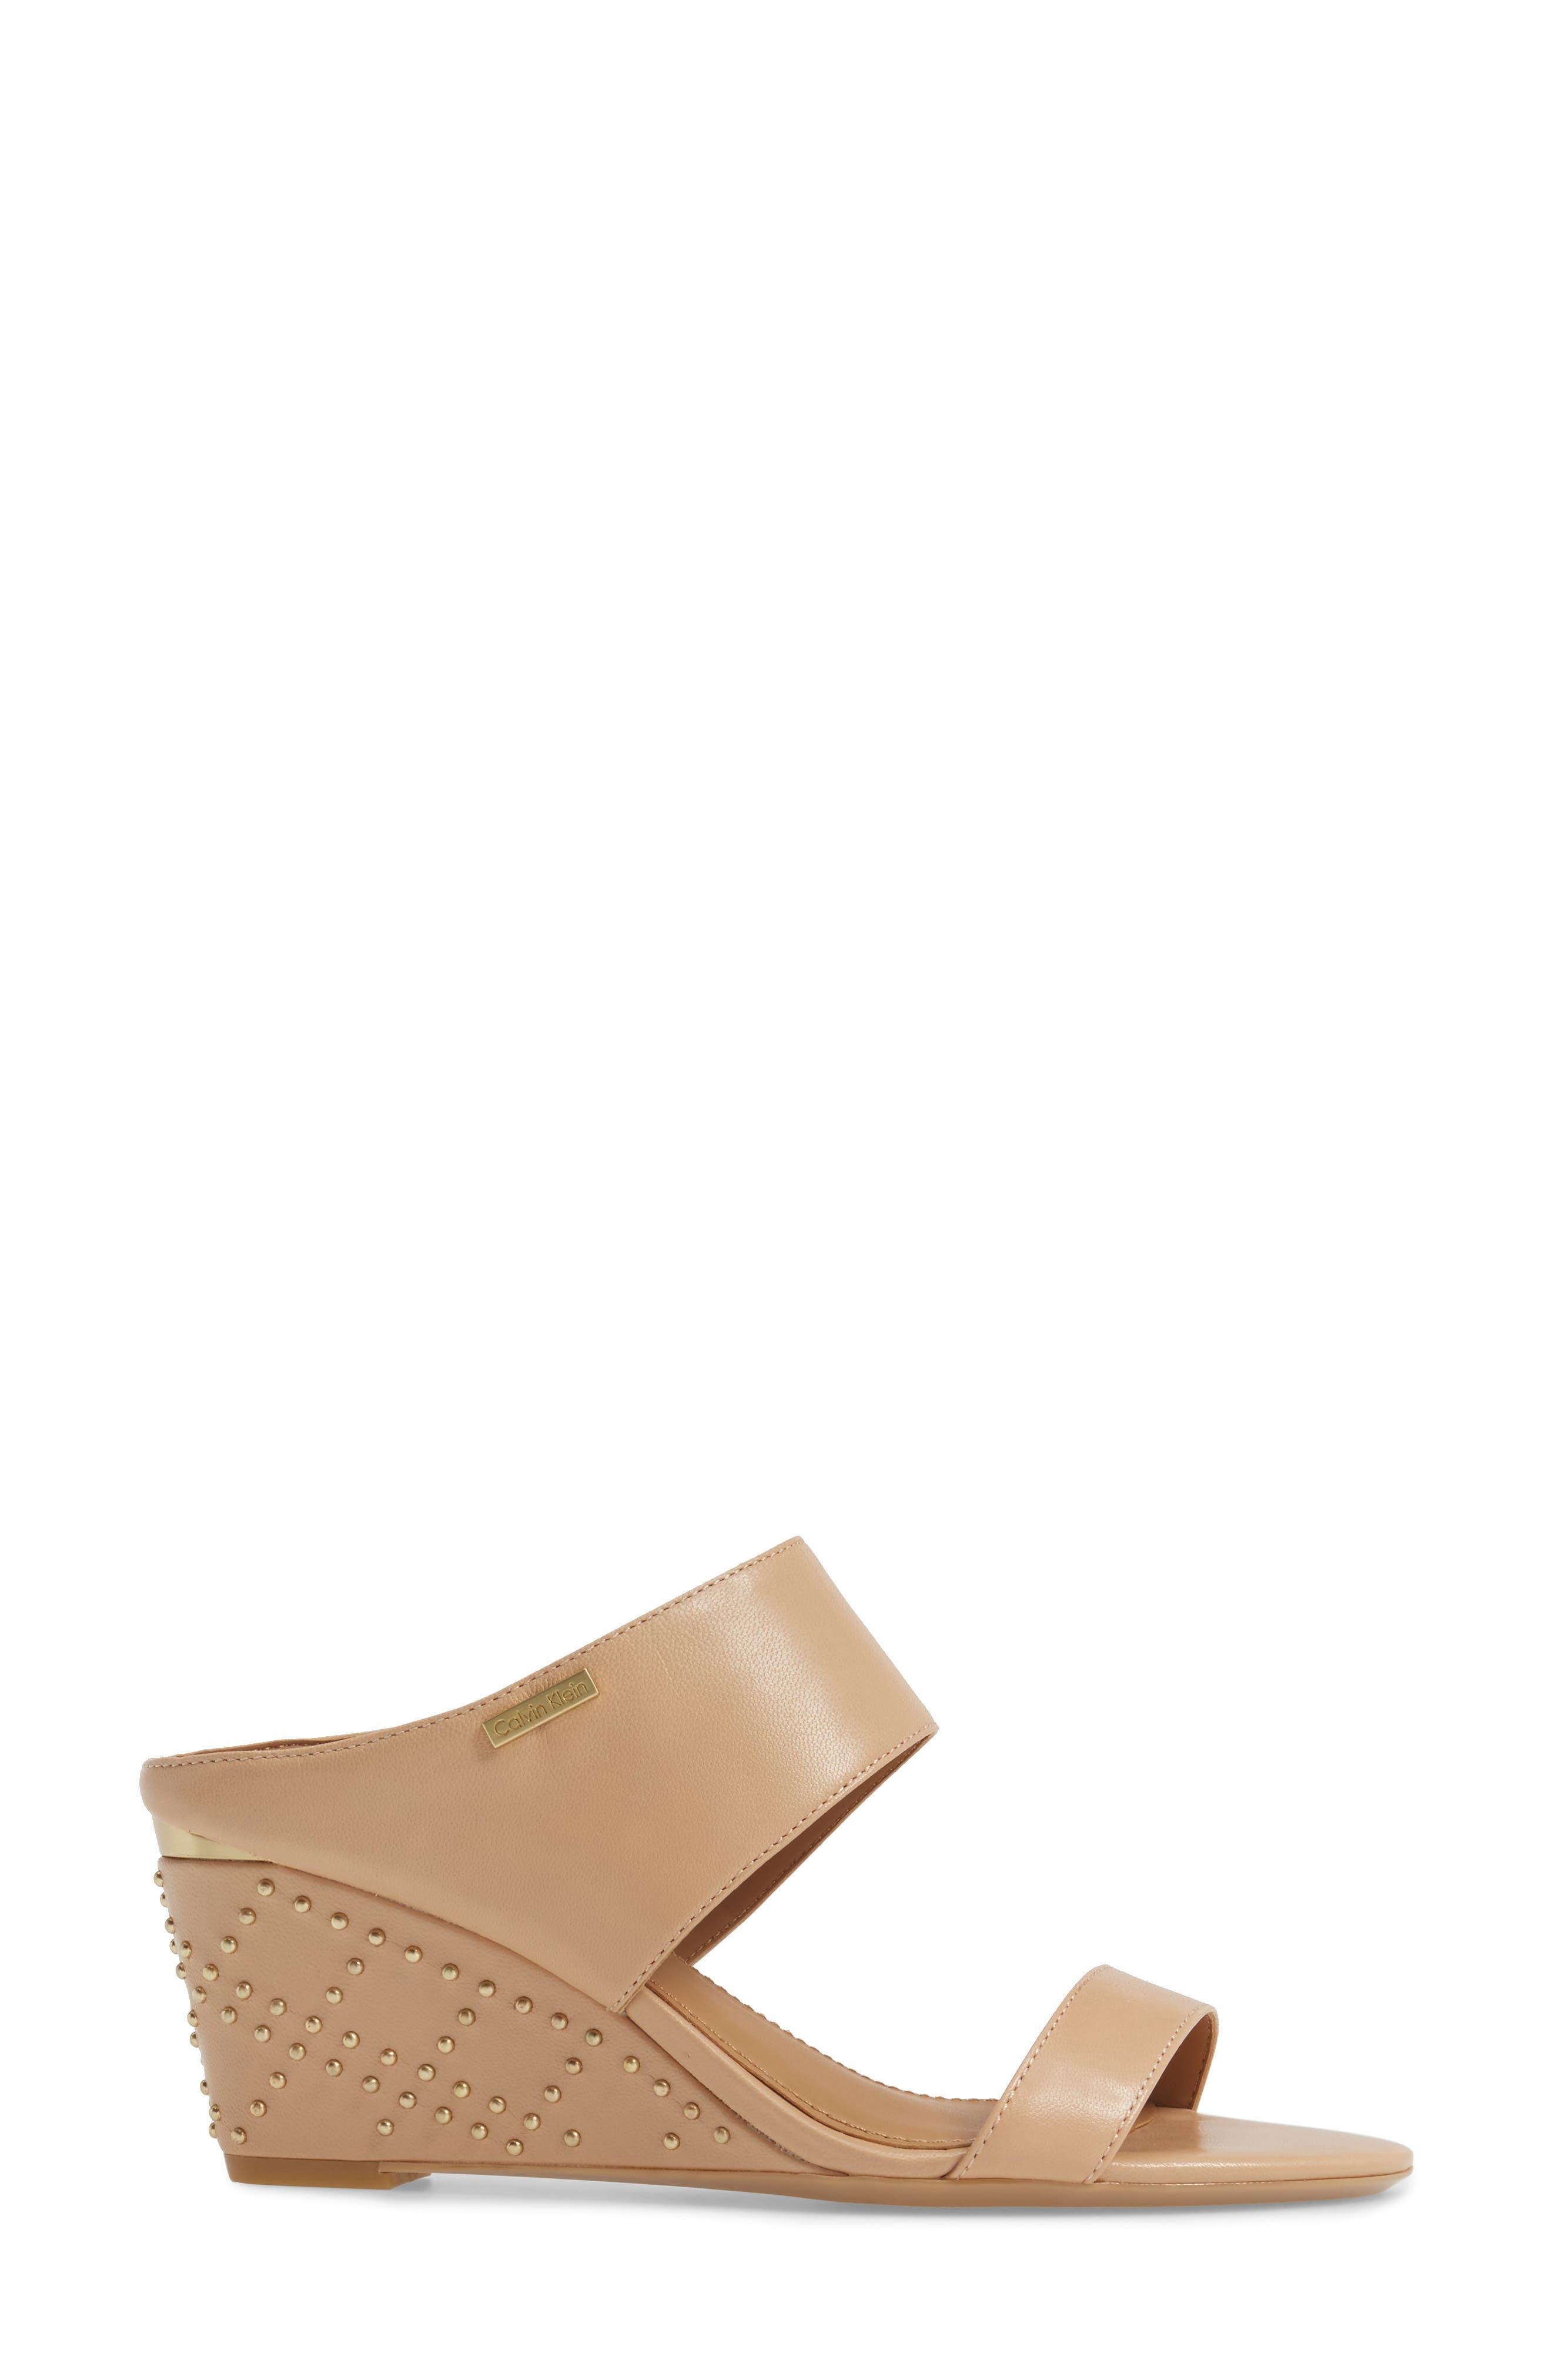 Phyllis Studded Wedge Sandal,                             Alternate thumbnail 12, color,